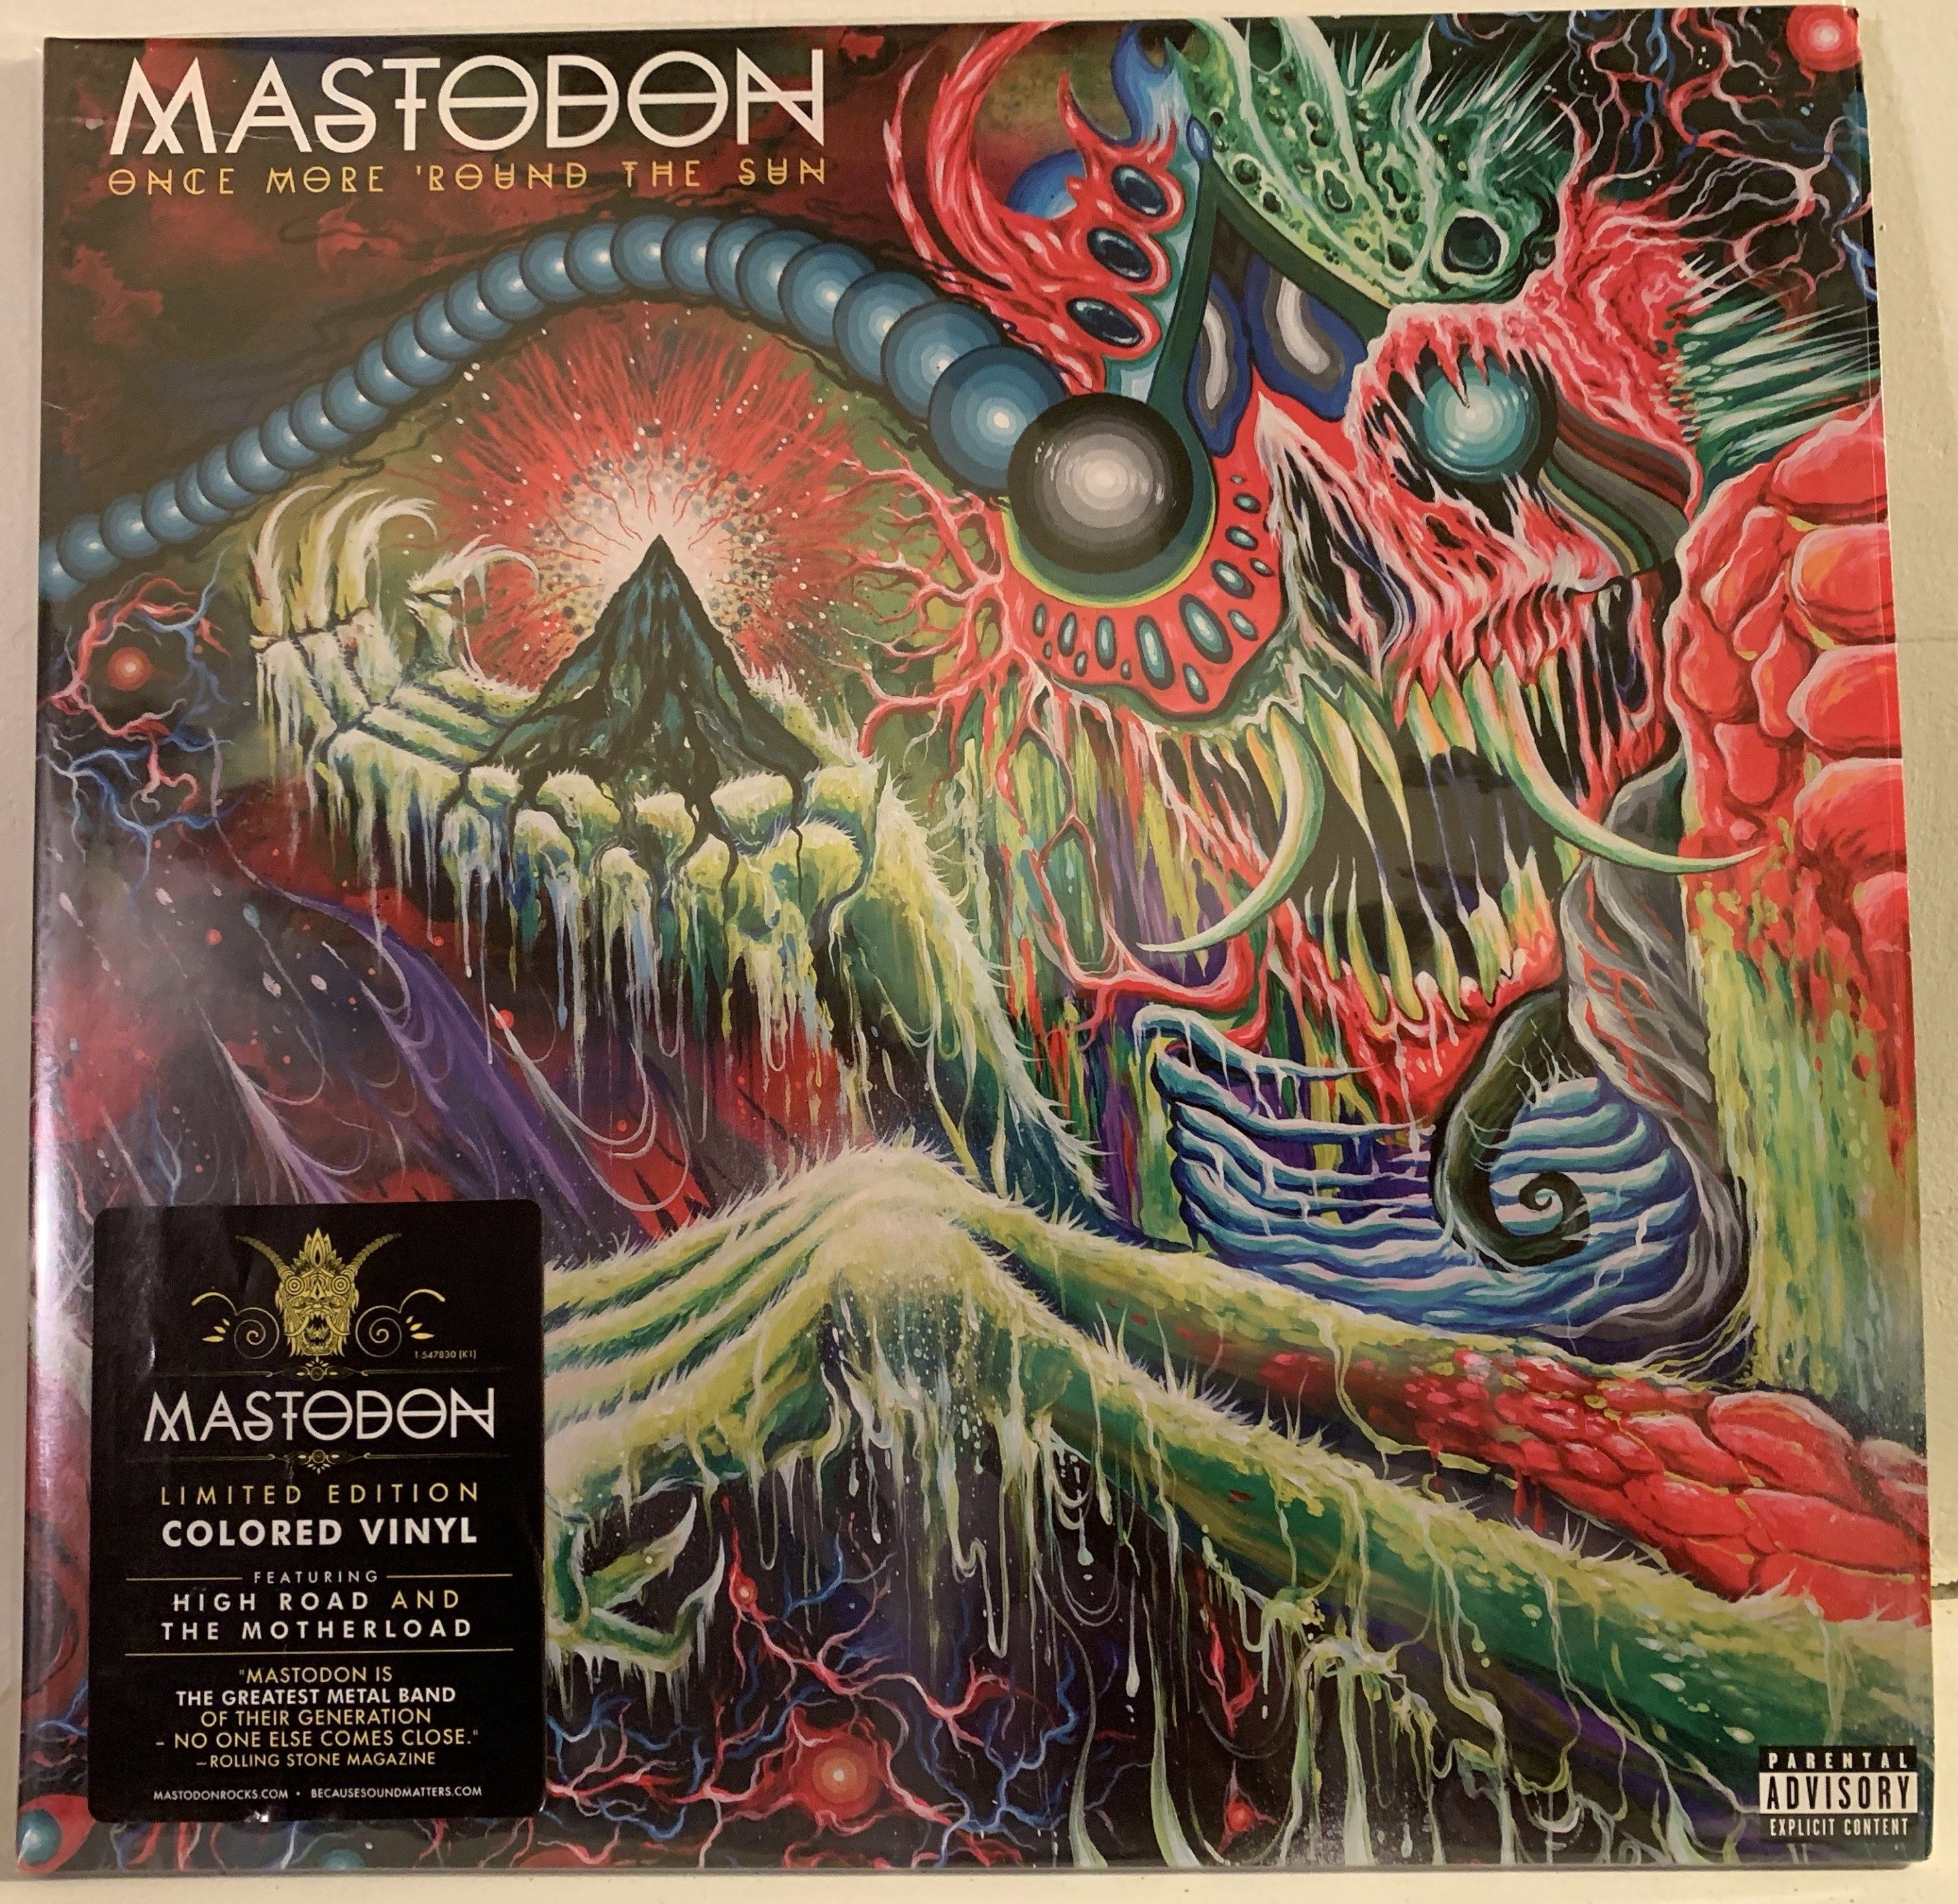 Mastodon Once More Round The Sun 2x Lp Colored Vinyl Gatefold Thrash Metal Iq Vinyl Mastodon Thrash Metal